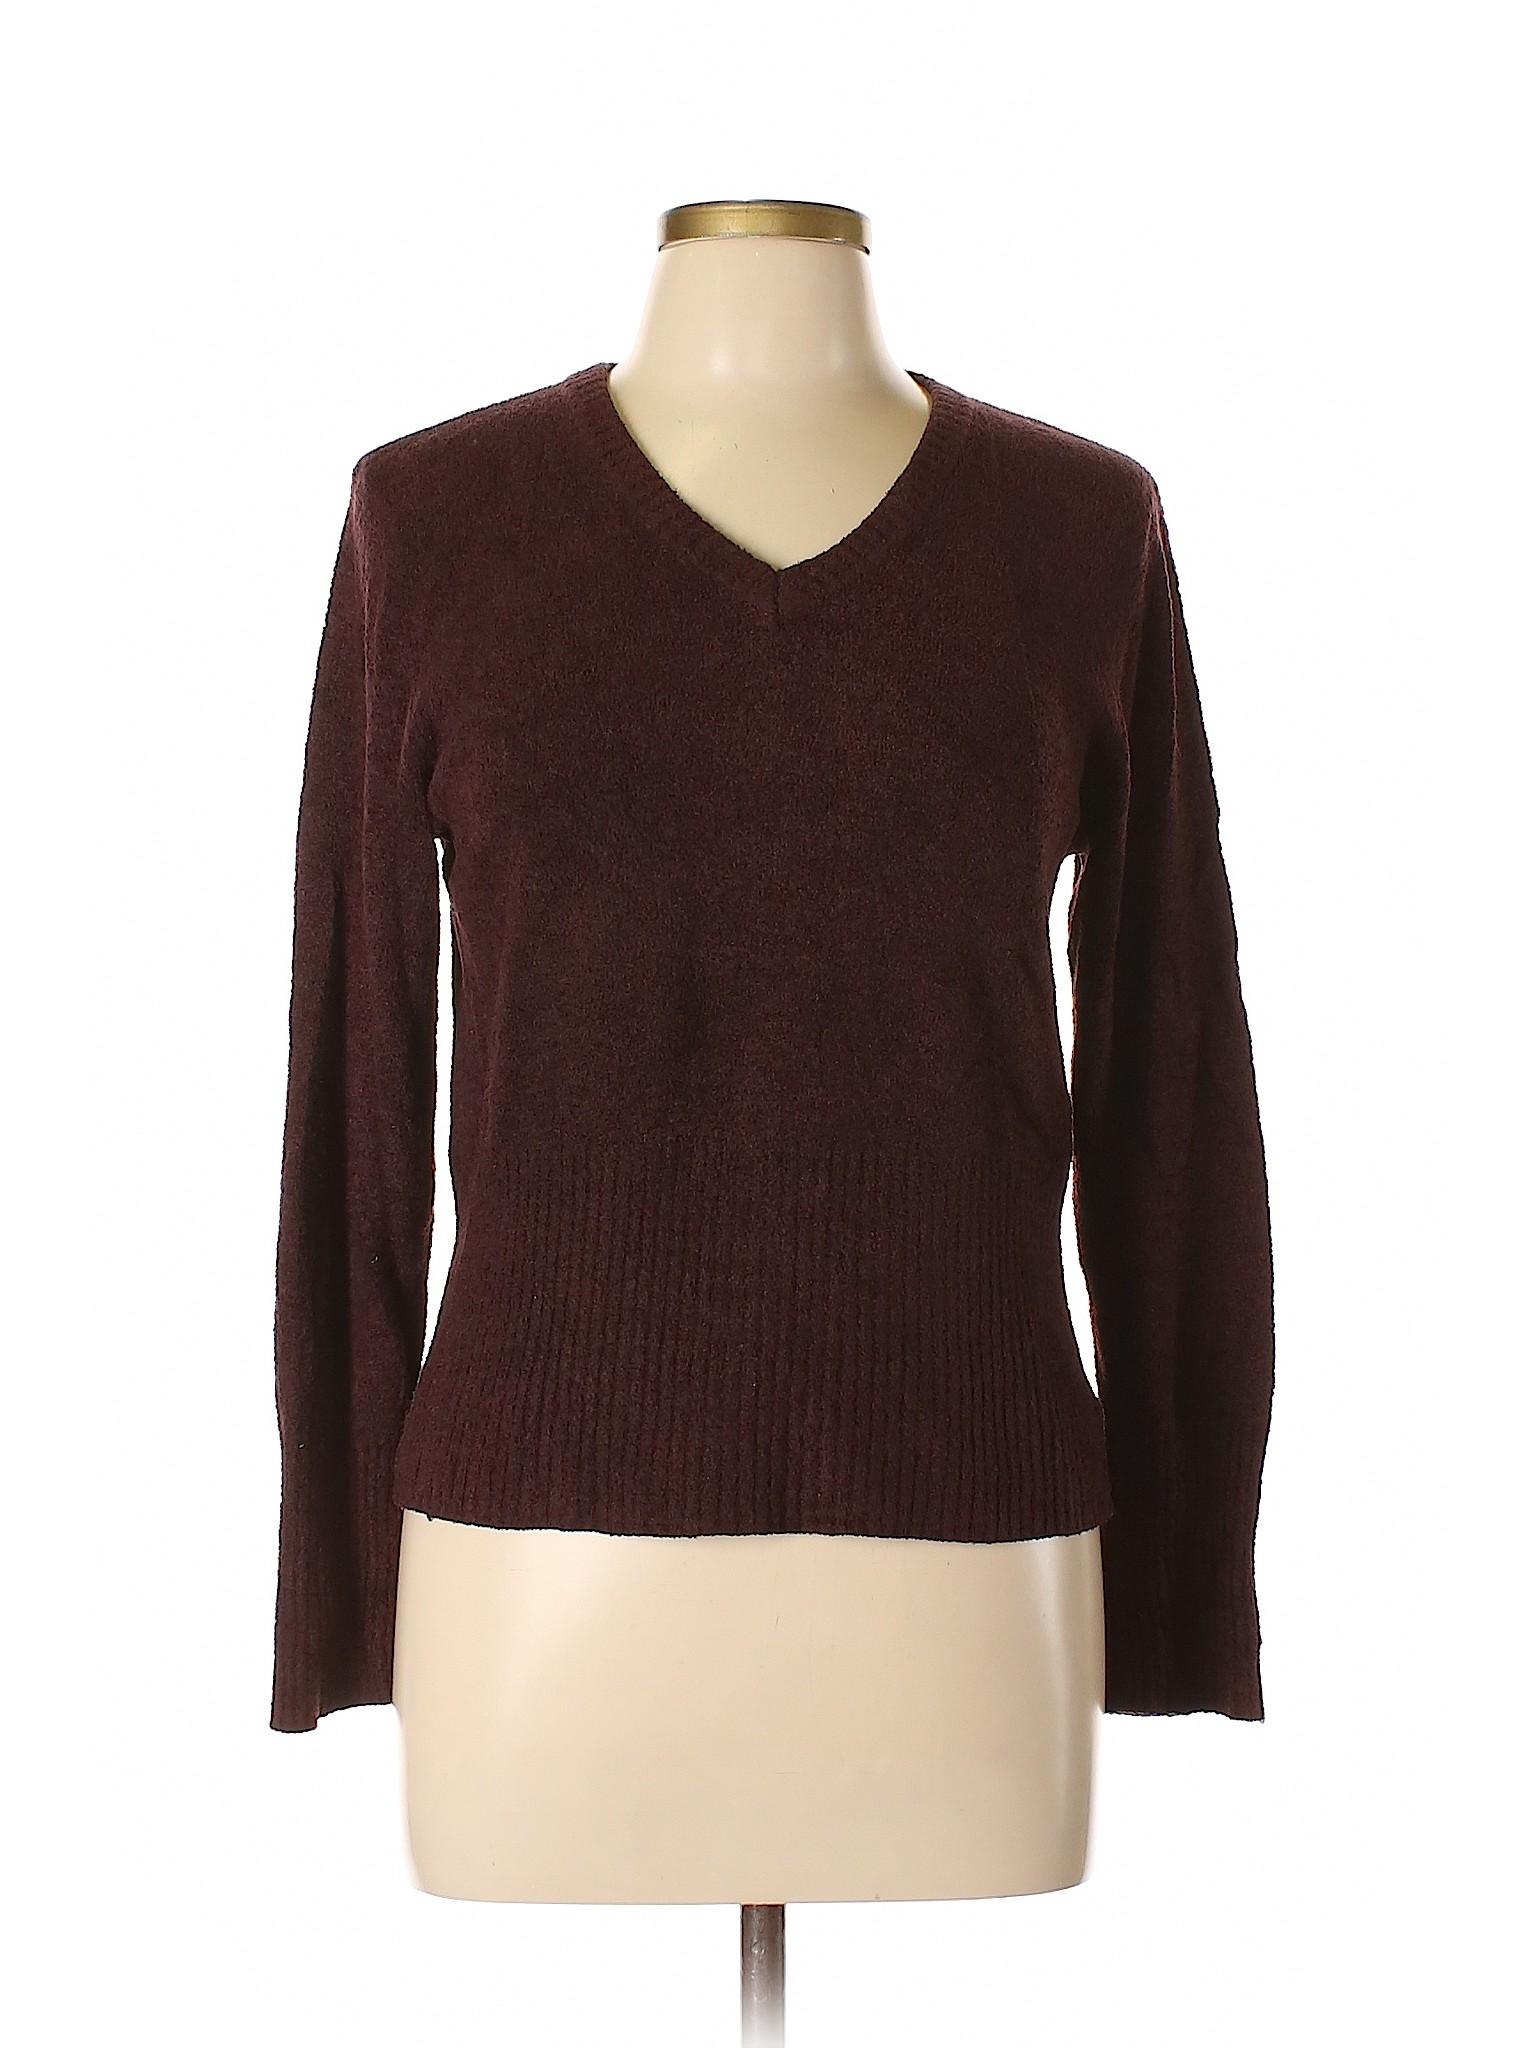 Boutique winter winter Columbia Pullover Columbia Sweater Pullover Boutique Pullover Columbia Sweater Boutique winter OUgnq5